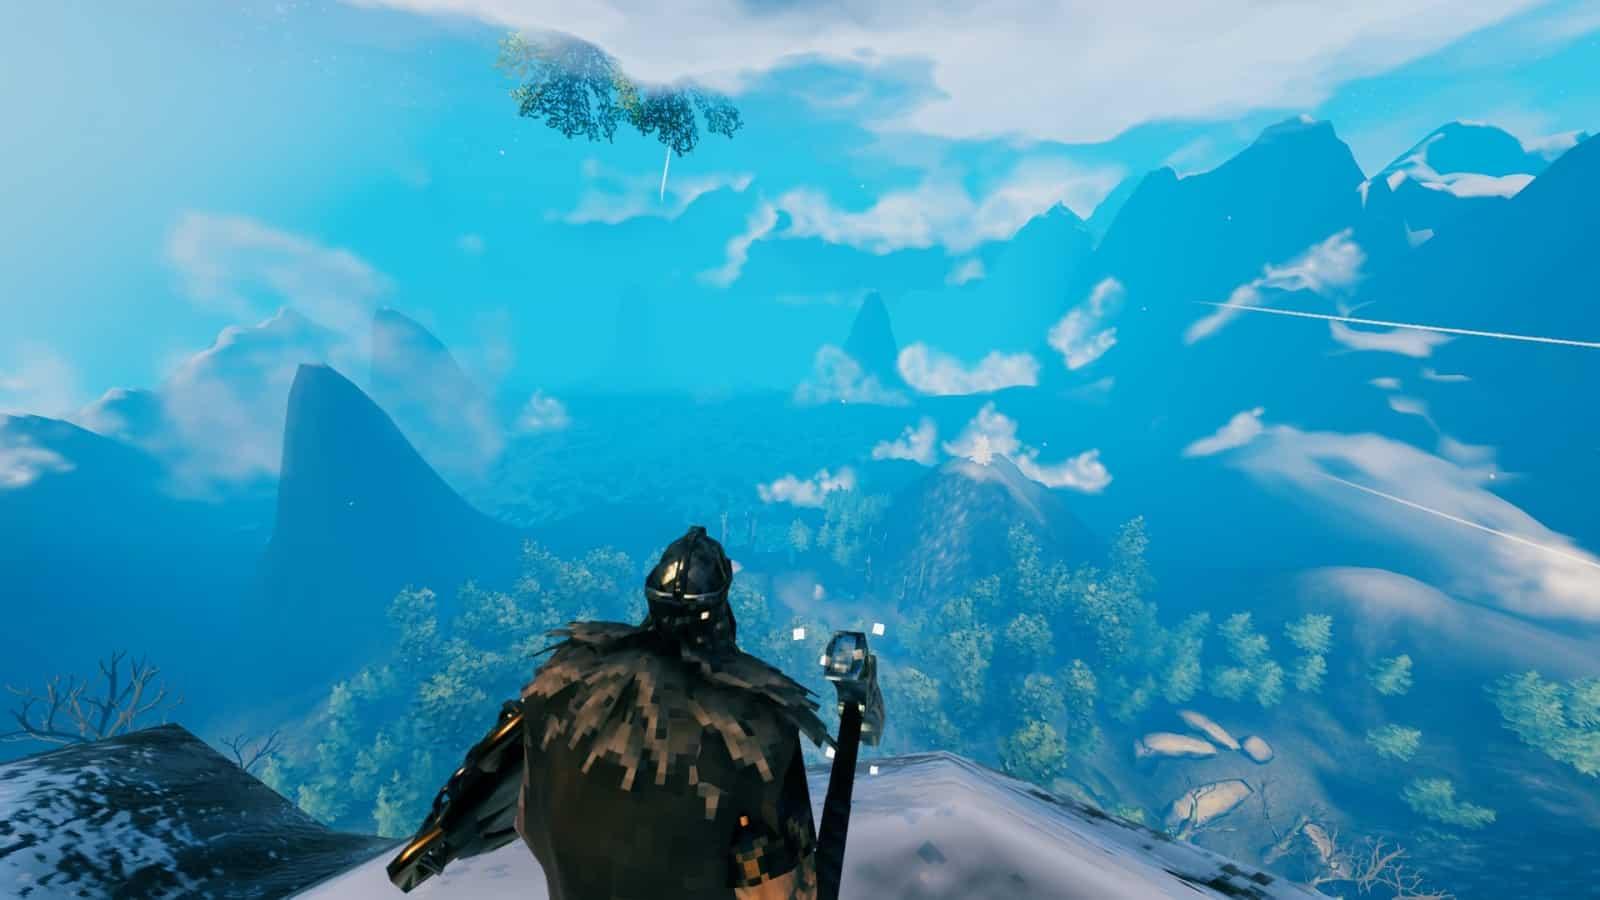 Northrend Recreated In Playable Valheim Mod 6